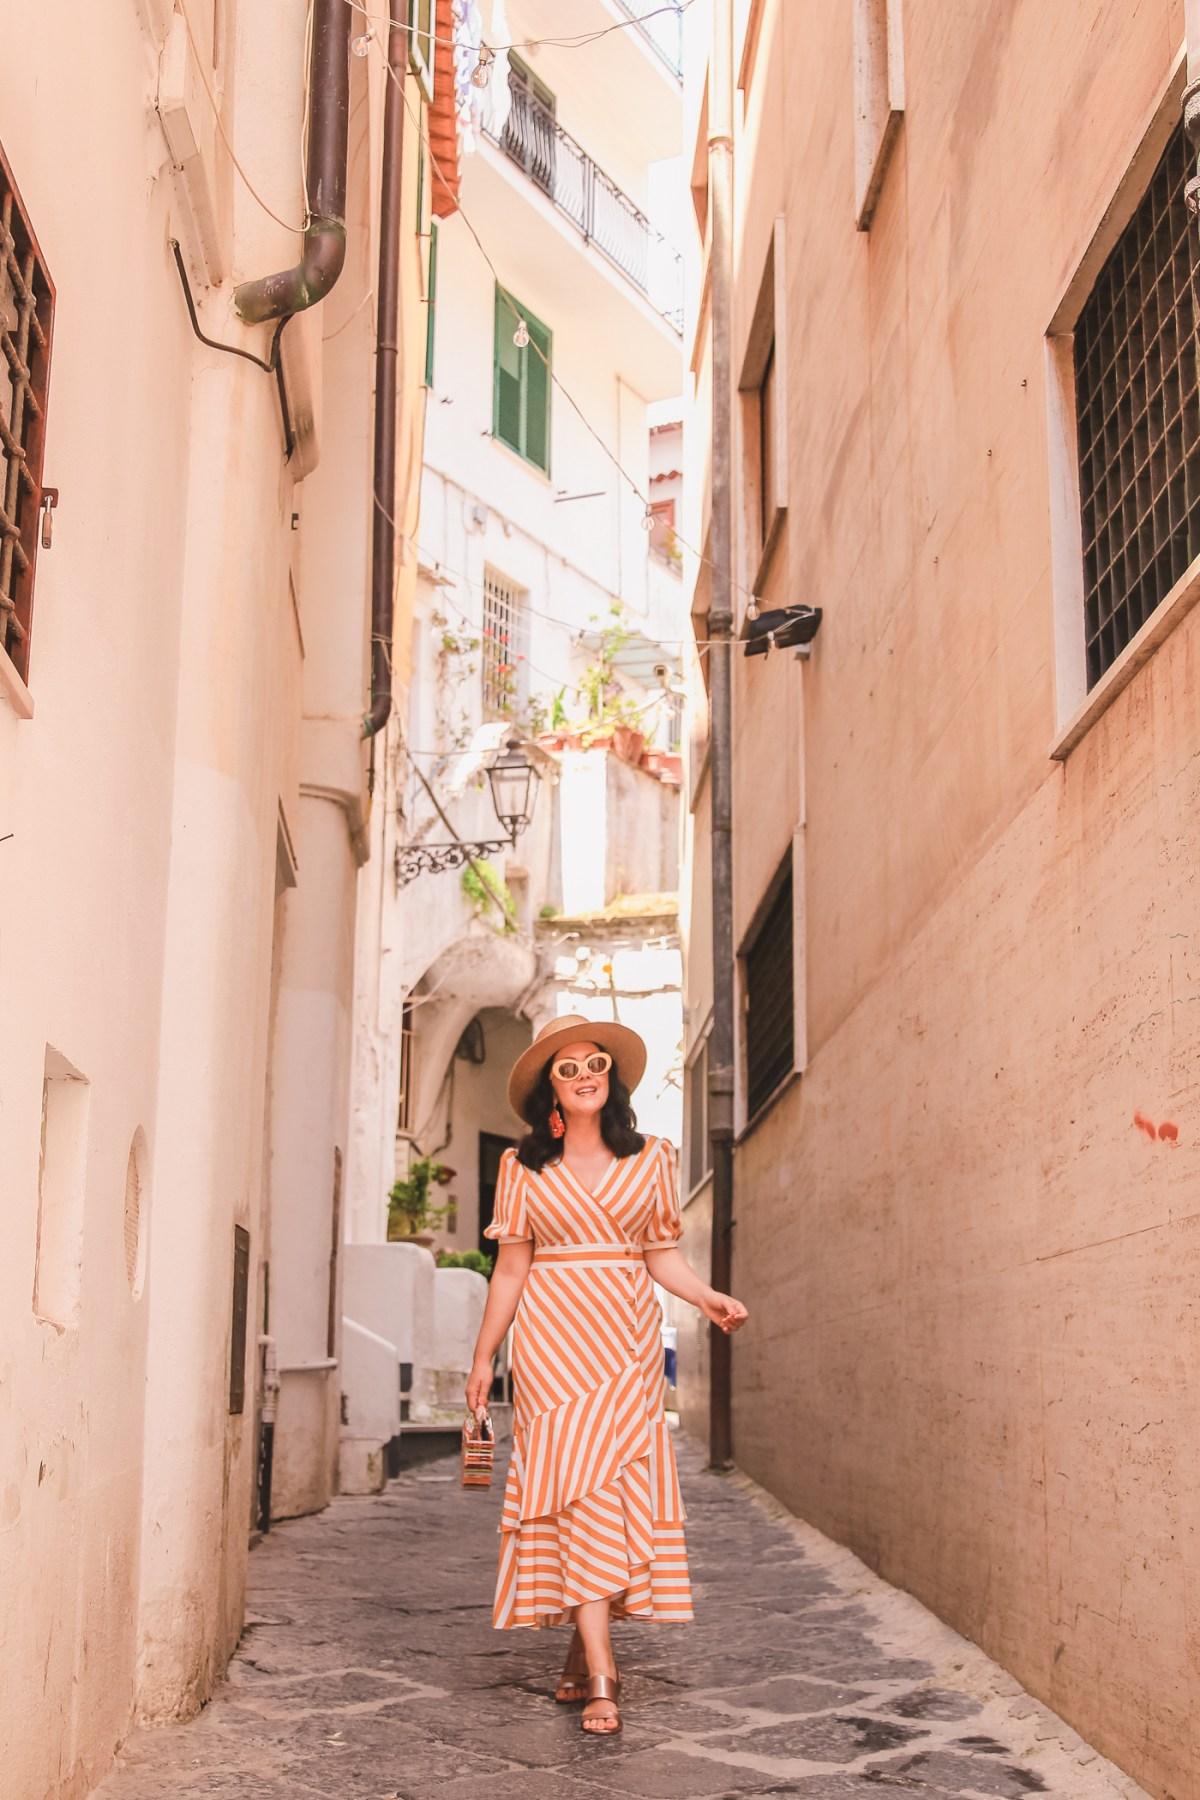 Stripes on Stripes in Amalfi